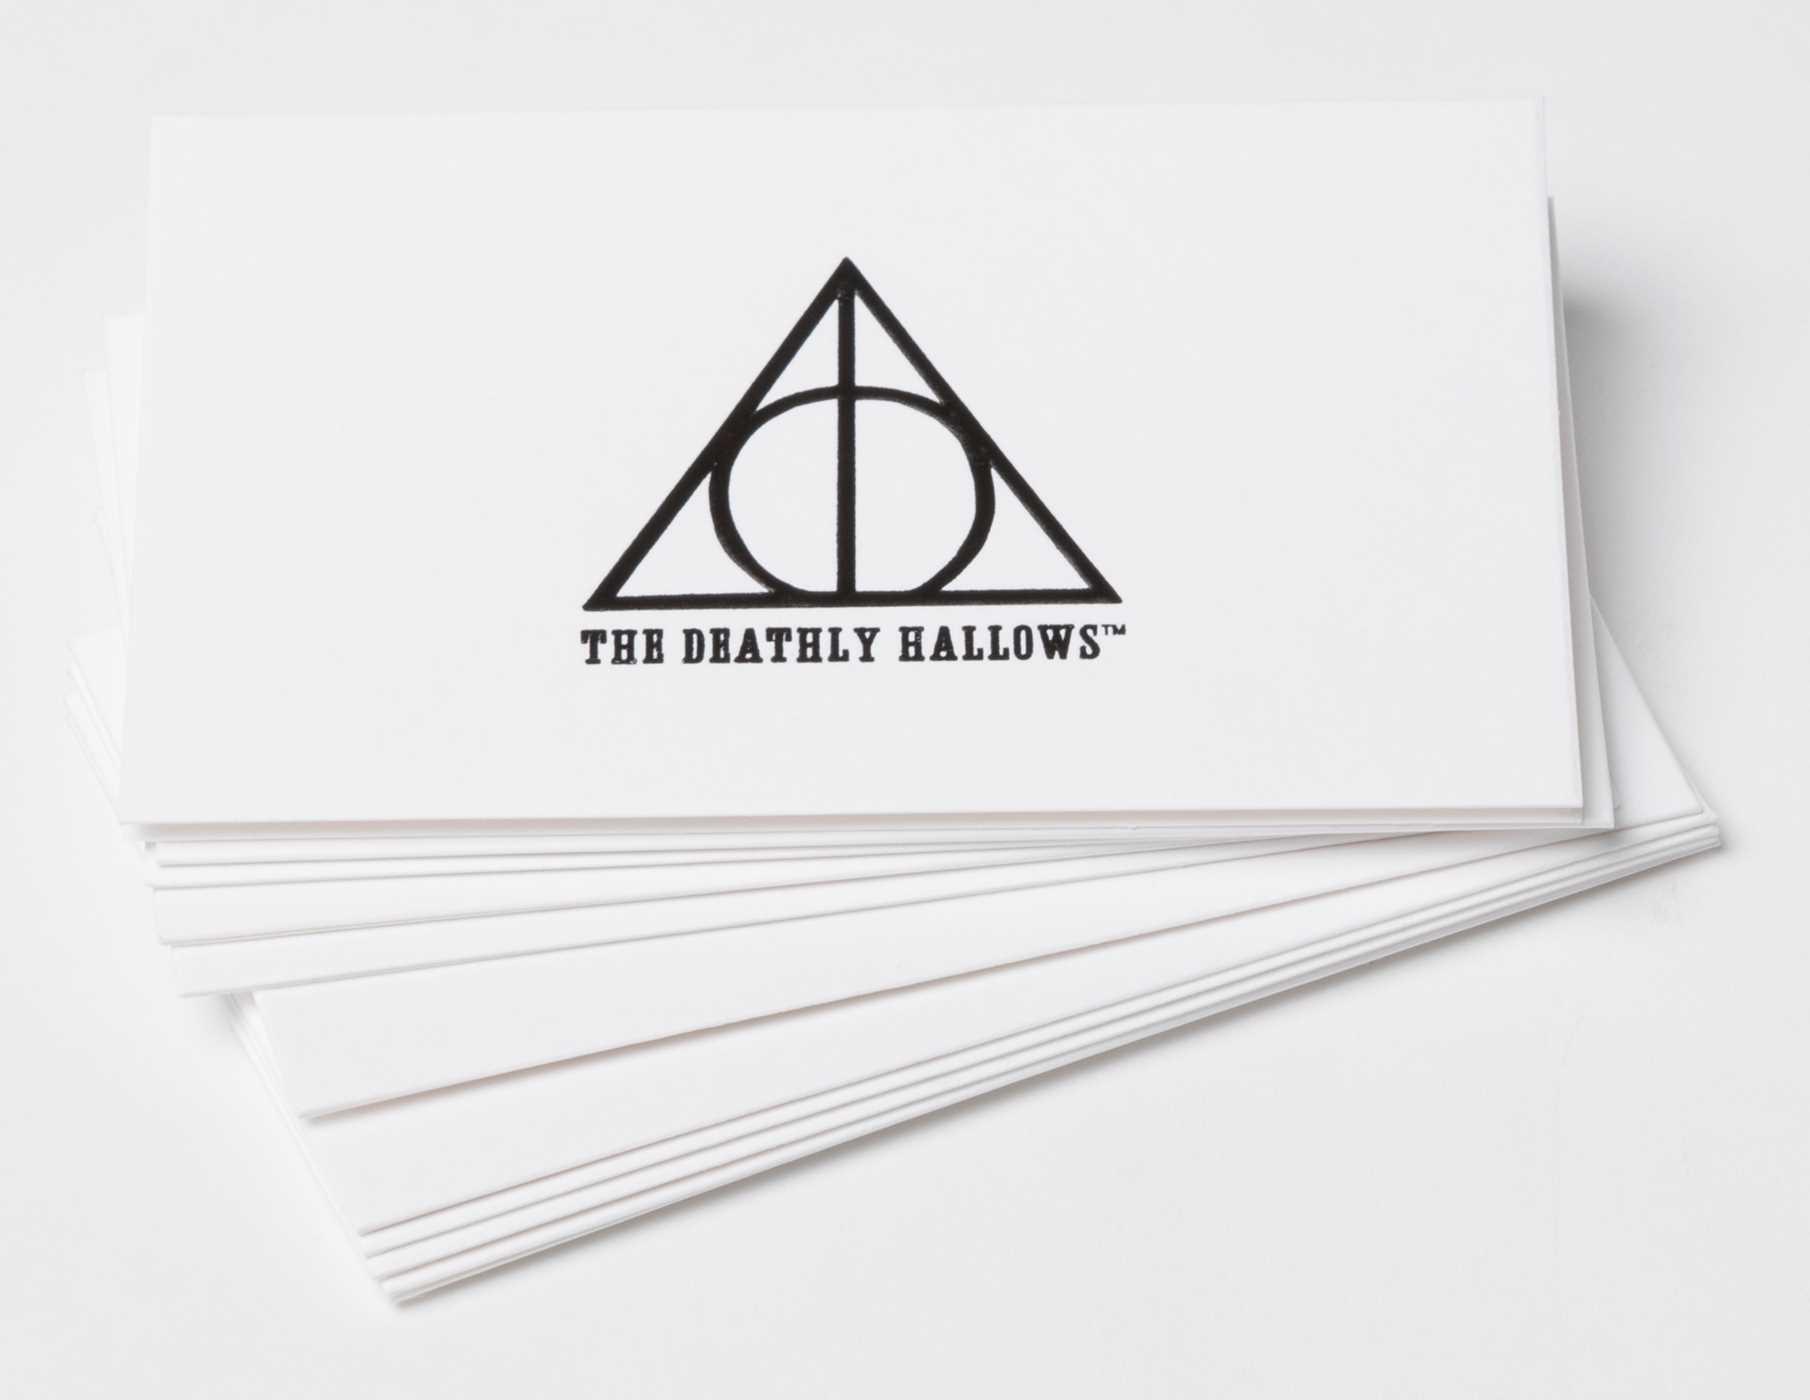 Harry Potter Deathly Hallows Foil Gift Enclosure Cards Set Of 10